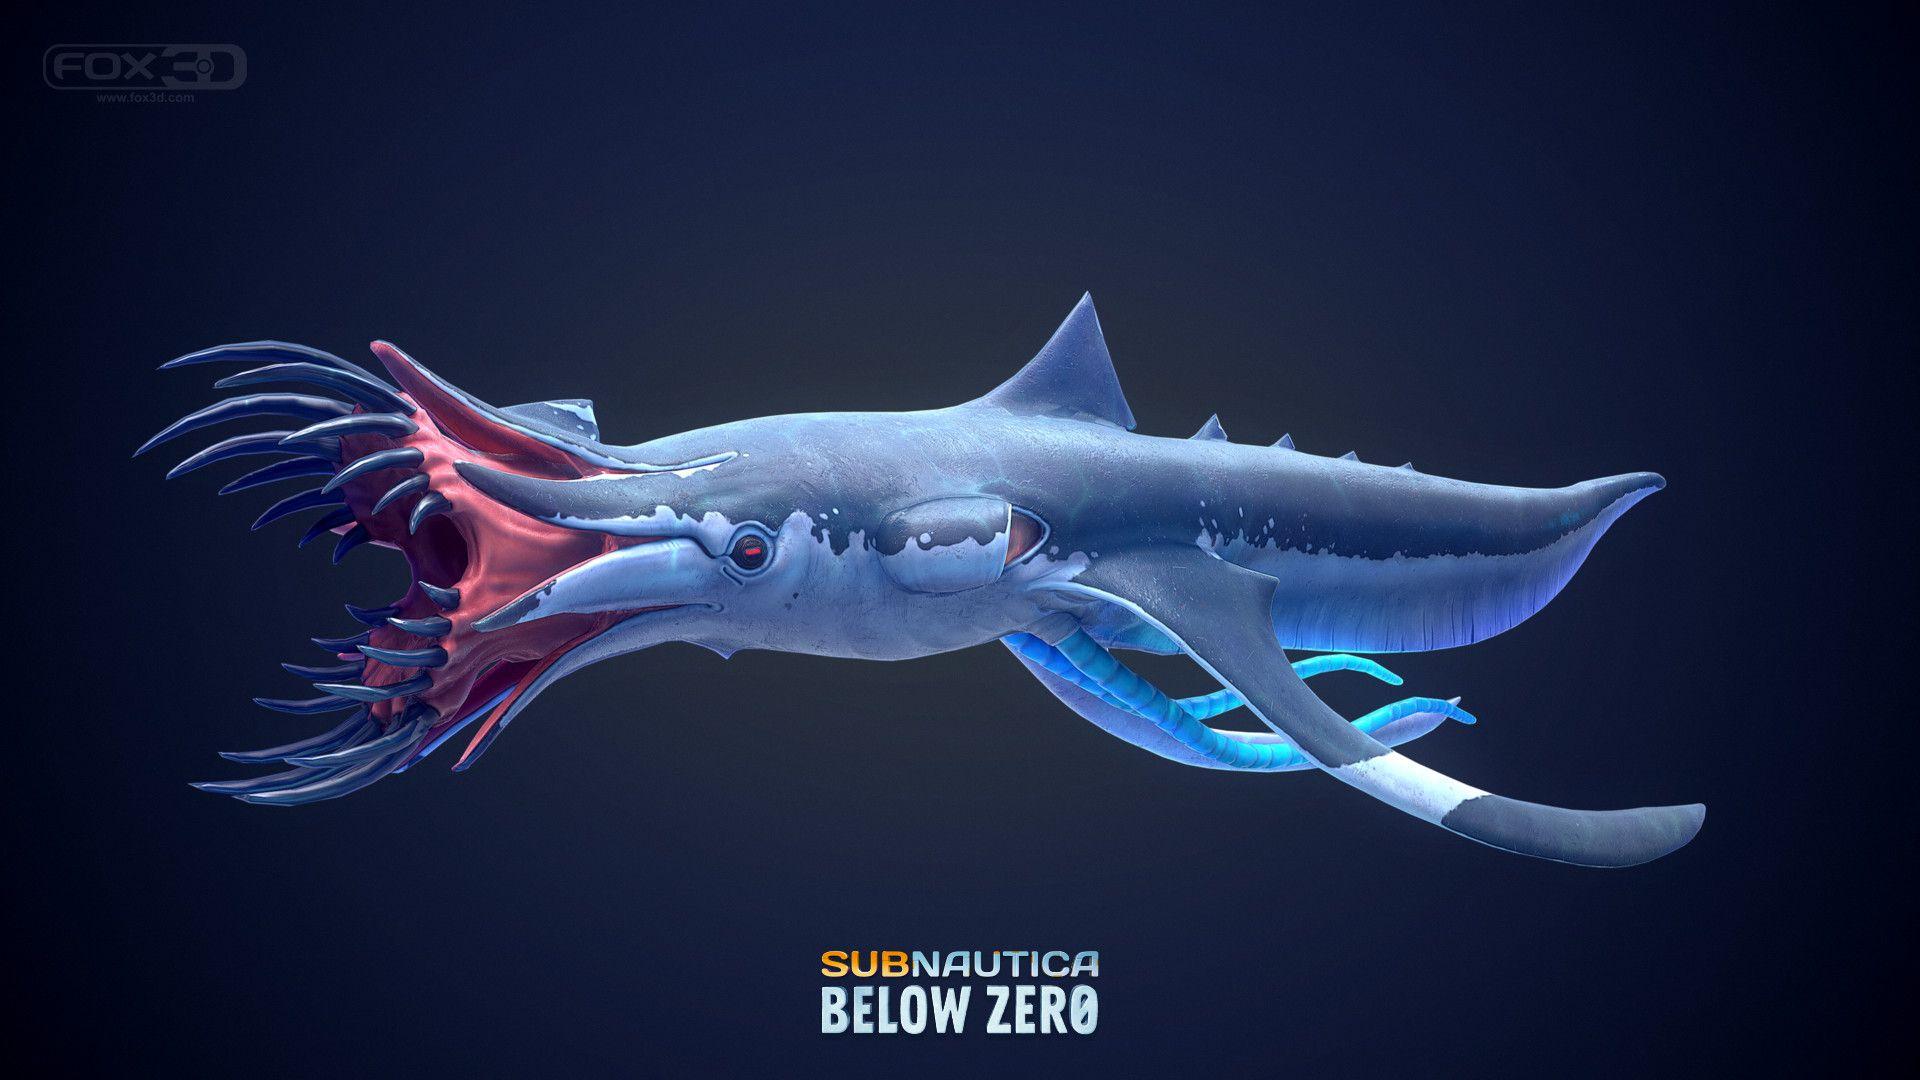 ArtStation - Subnautica: Below Zero, FOX3D ENTERTAINMENT